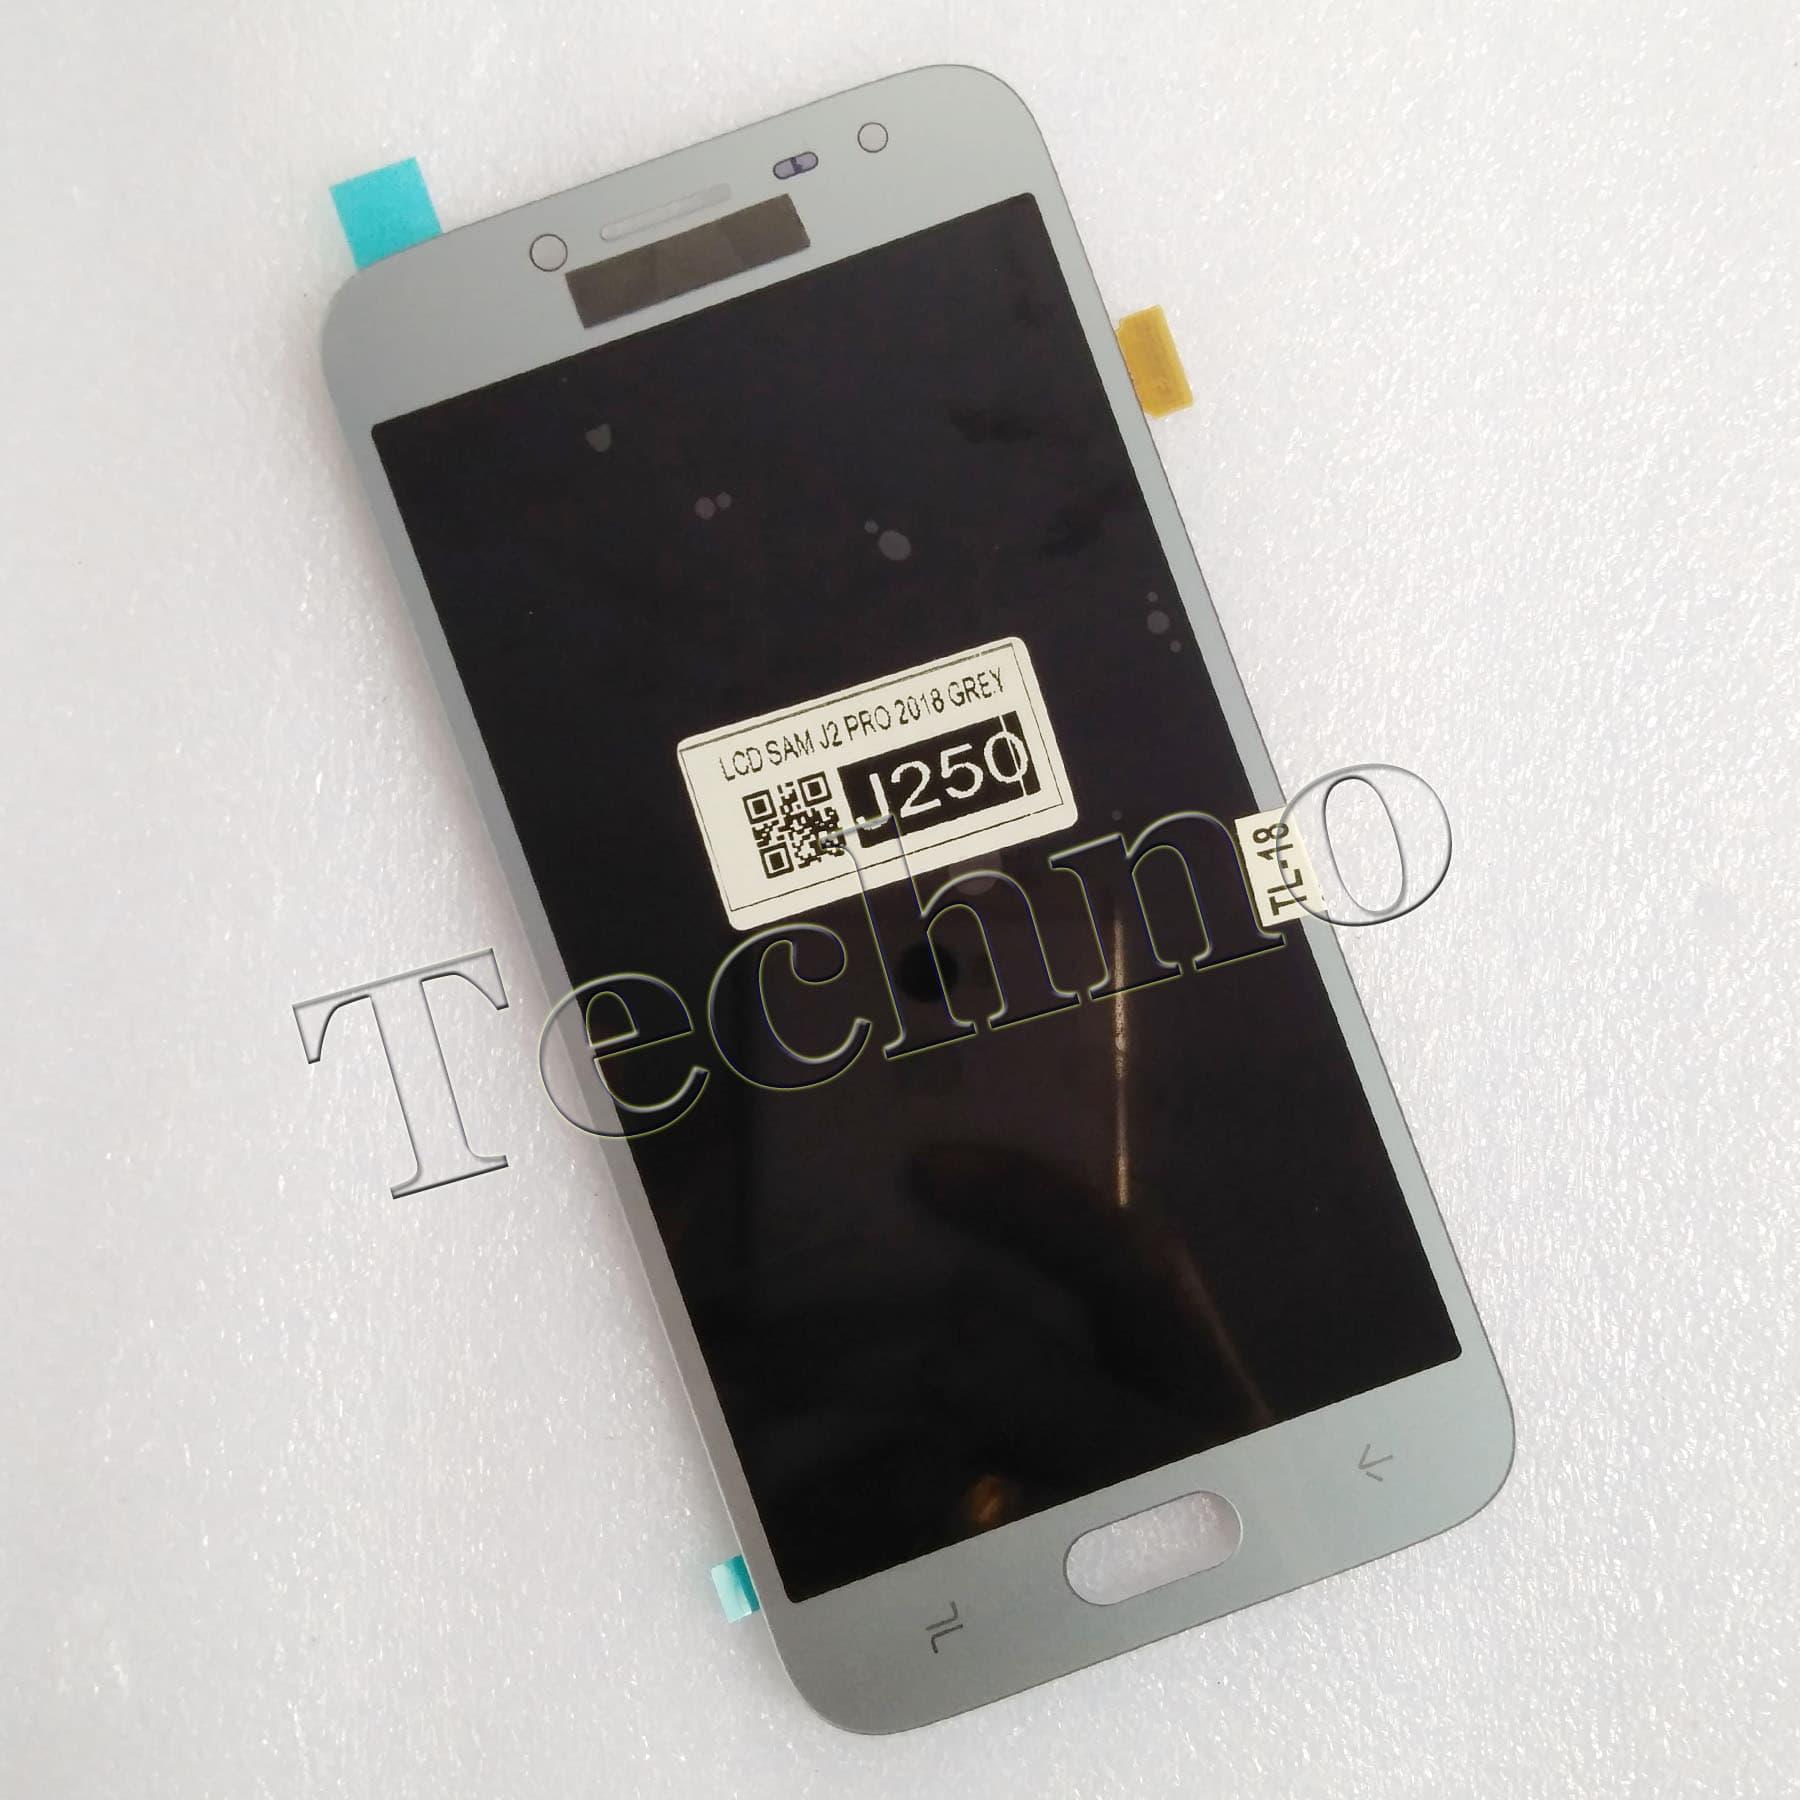 Fitur Lcd Samsung J250 Galaxy J2 Pro 2018 Full Touchacreen